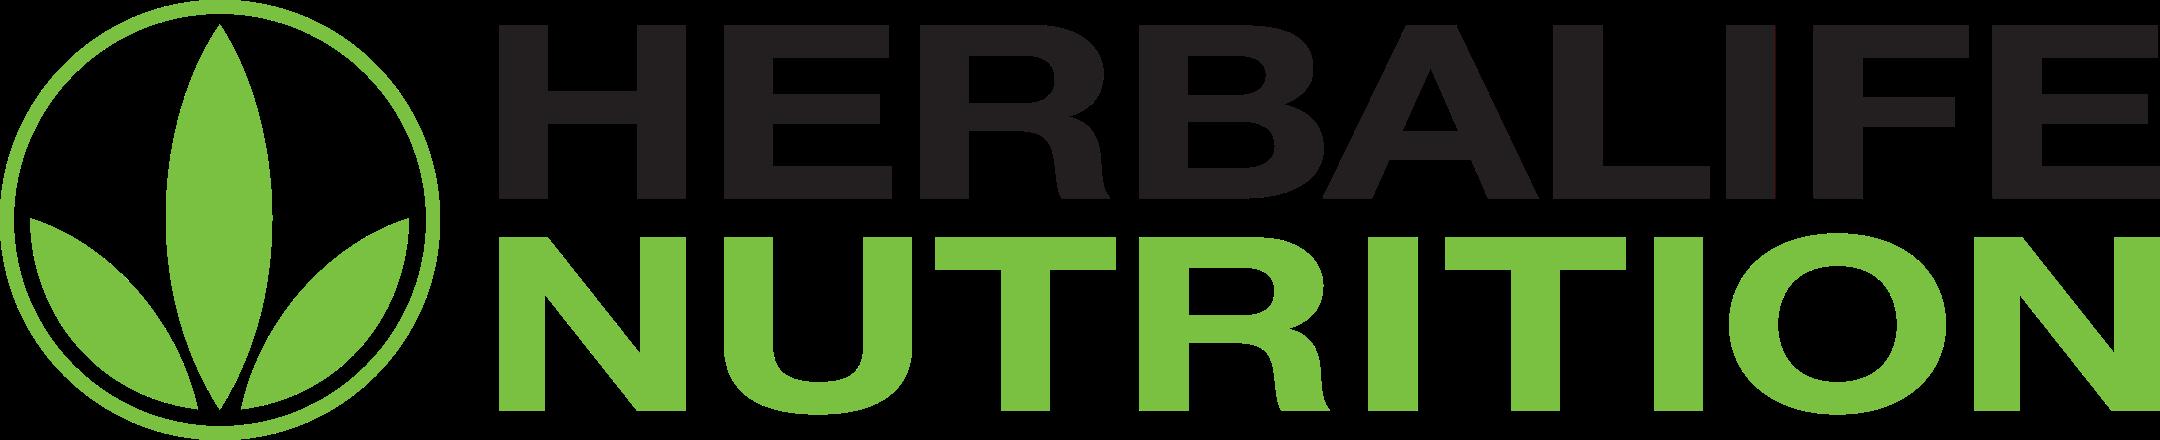 herbalife logo 1 1 - Herbalife Logo